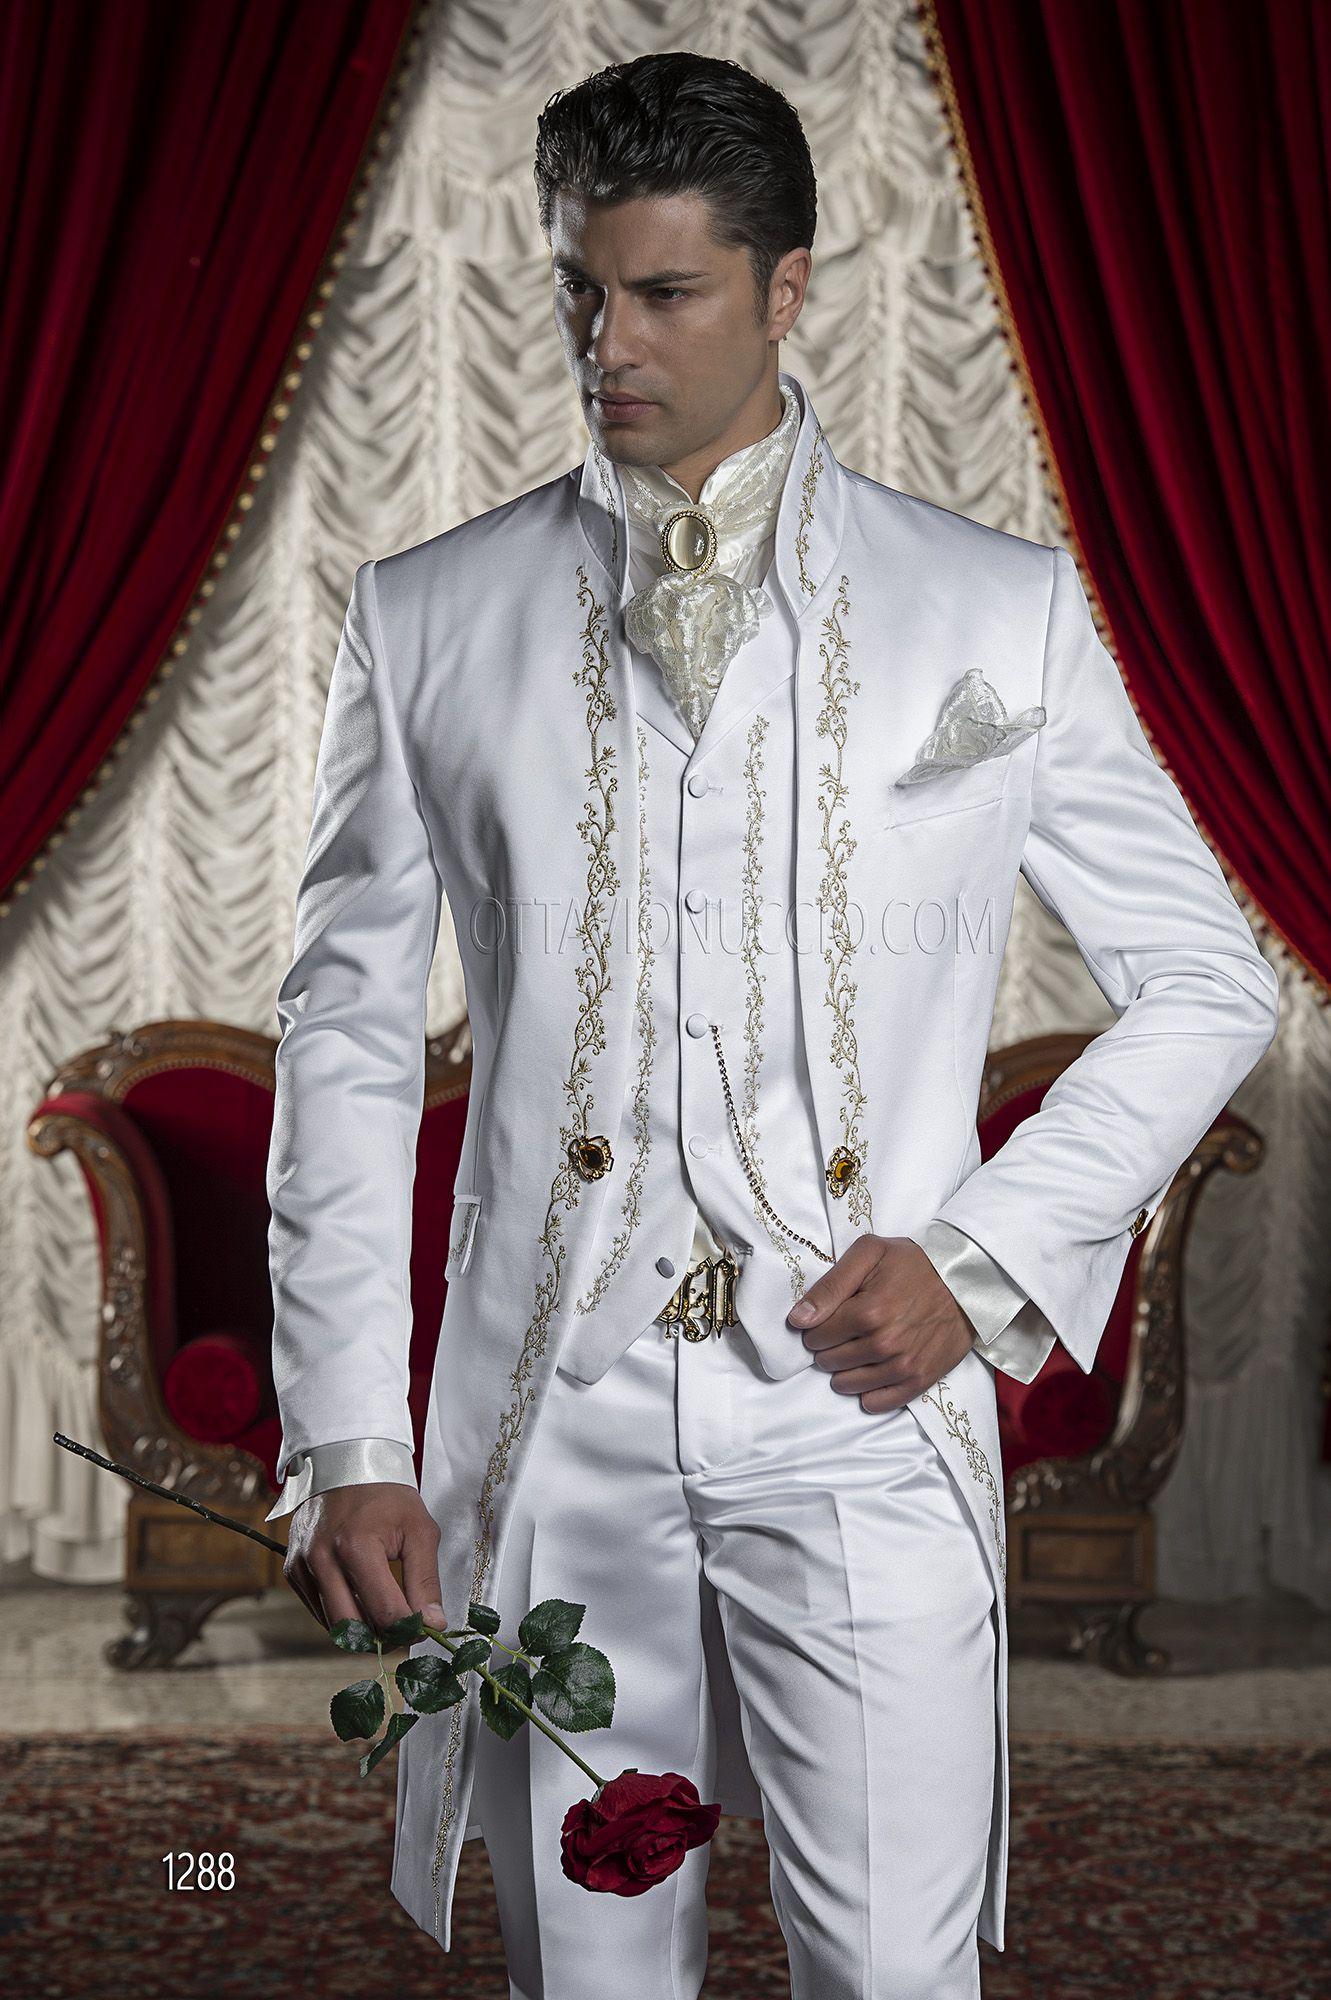 Vestito cerimonia uomo bianco